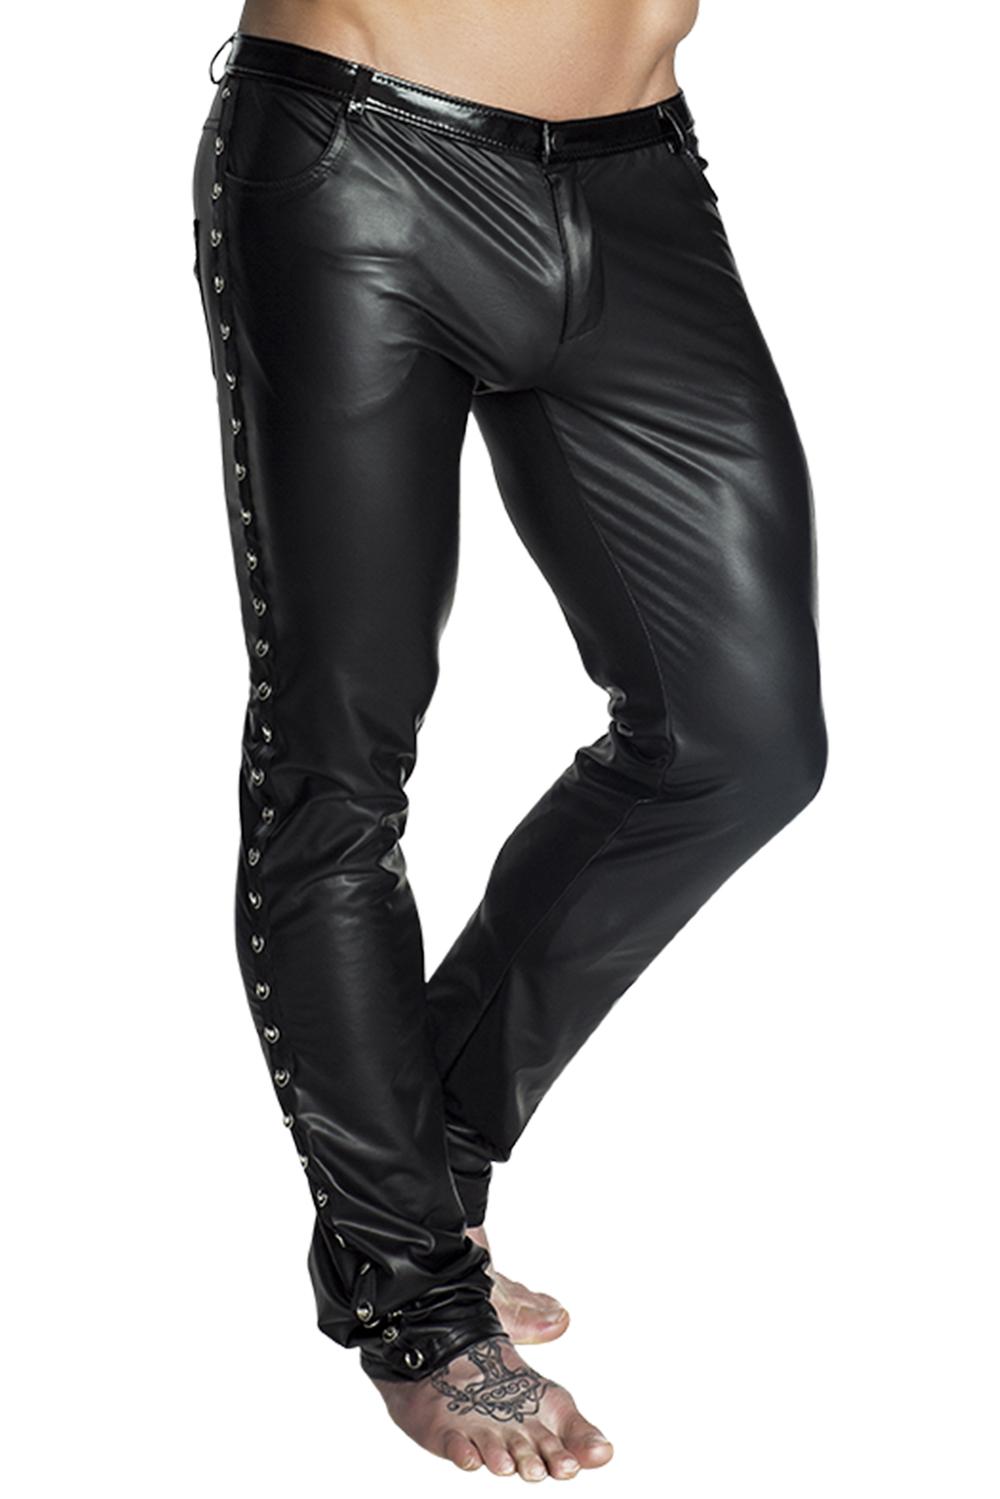 Schwarze lange Hose von Noir Handmade in Schwarz  (Wetlook-Material)